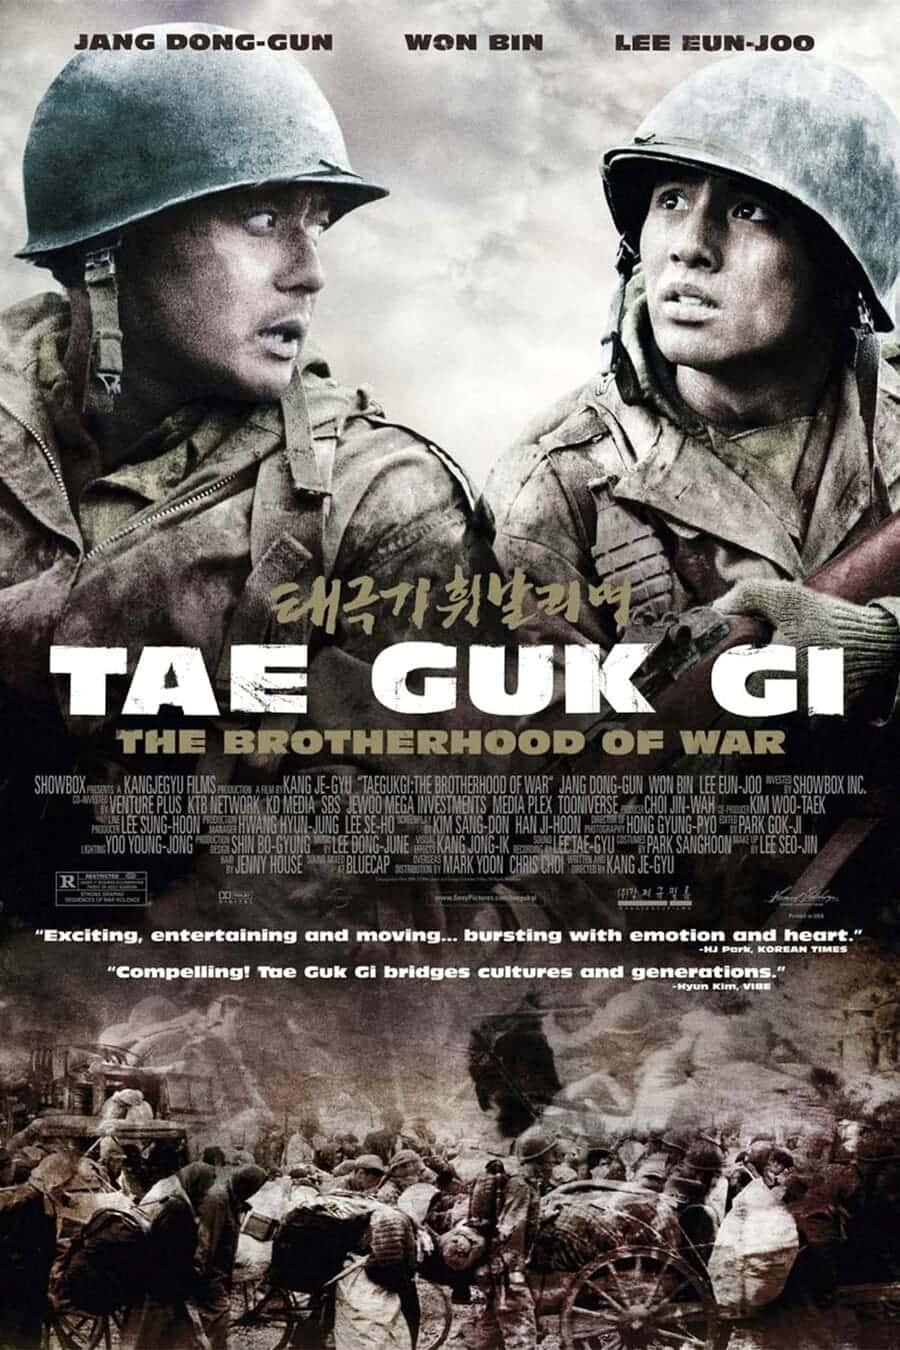 bộ phim tae guk the brotherhood of war